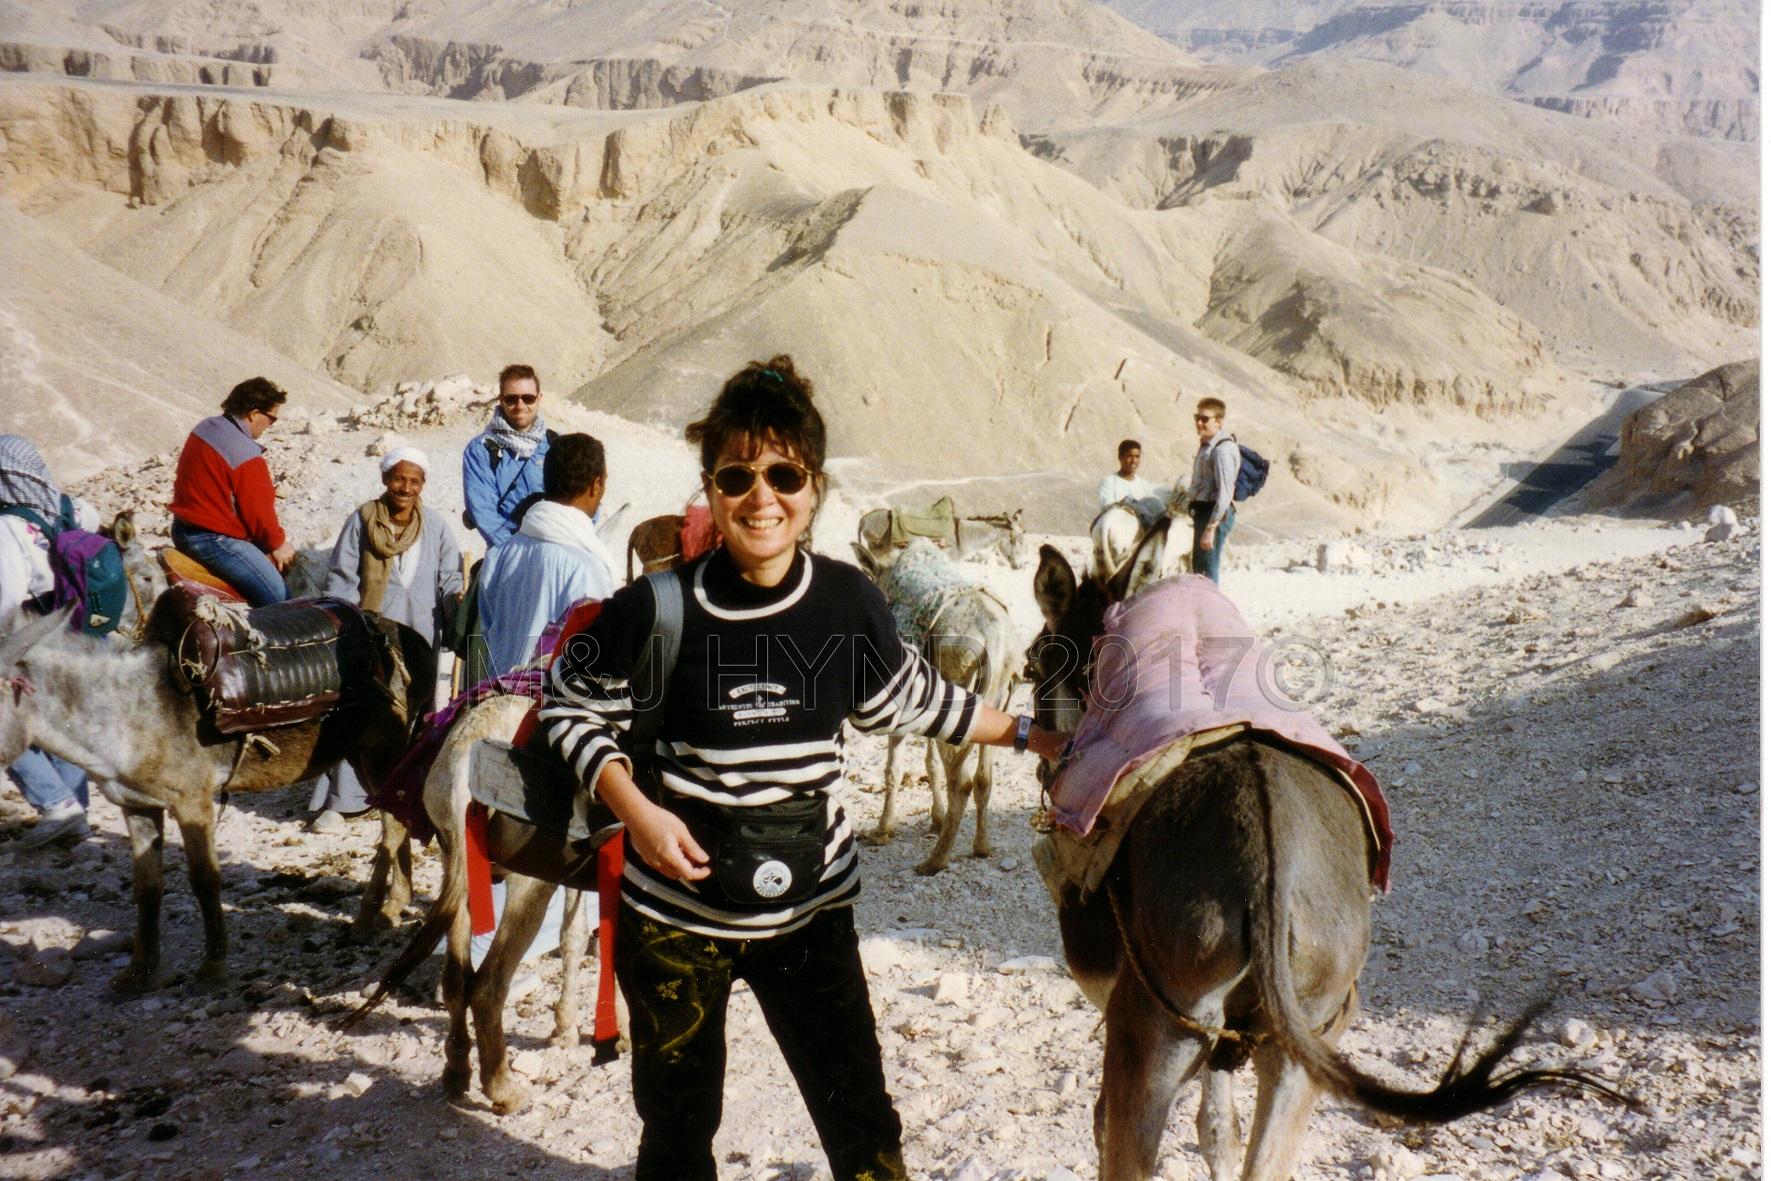 PreStroke ride on donkeys Valley of the Kings, Luxor, Egypt